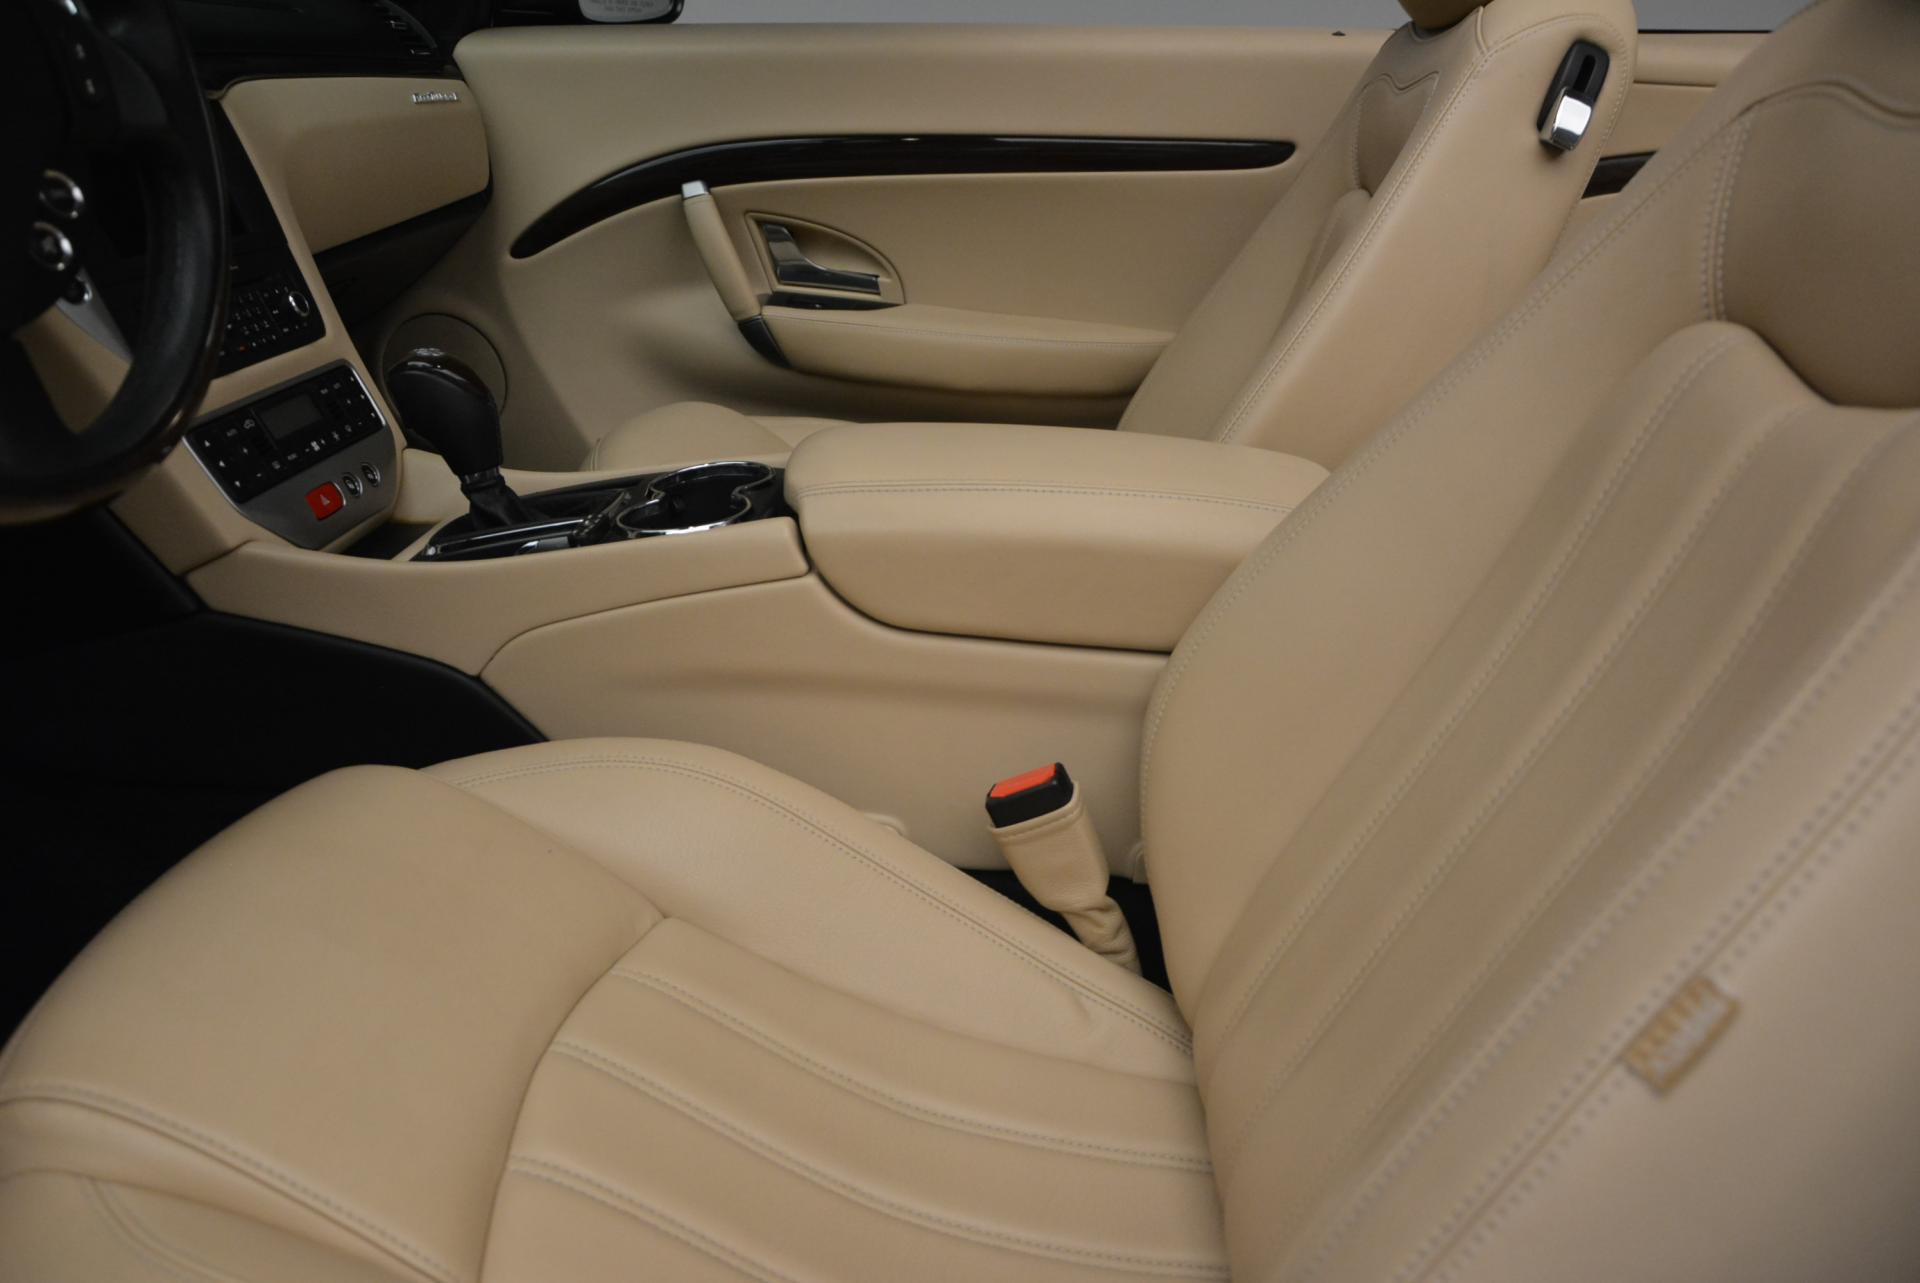 Used 2011 Maserati GranTurismo Base For Sale In Westport, CT 158_p27